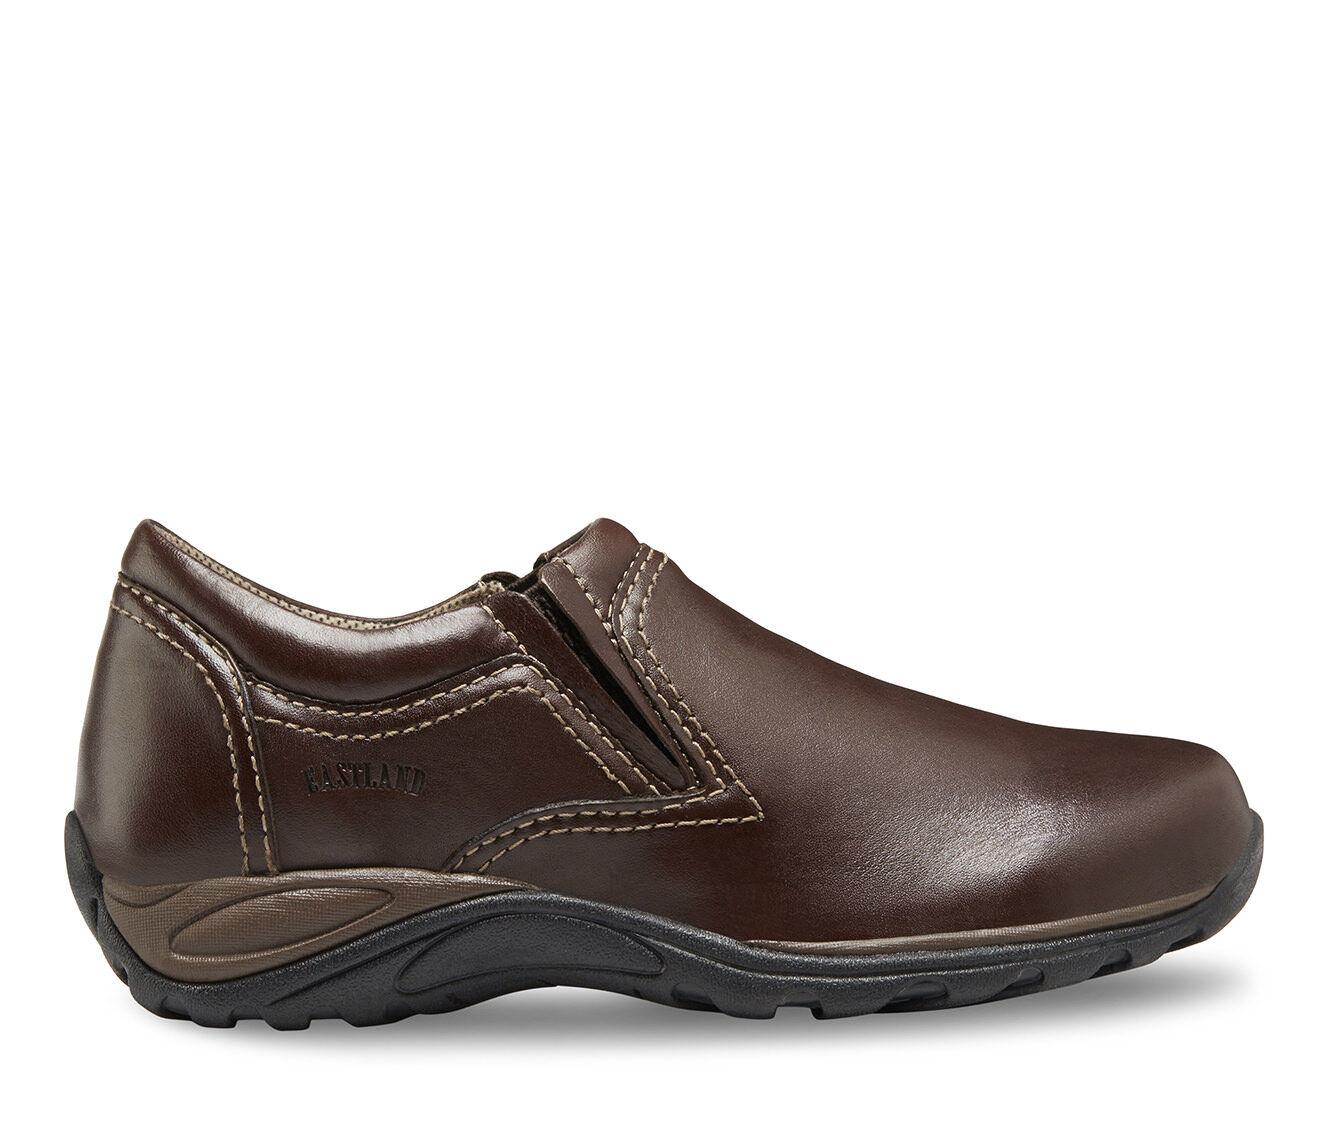 uk shoes_kd5736